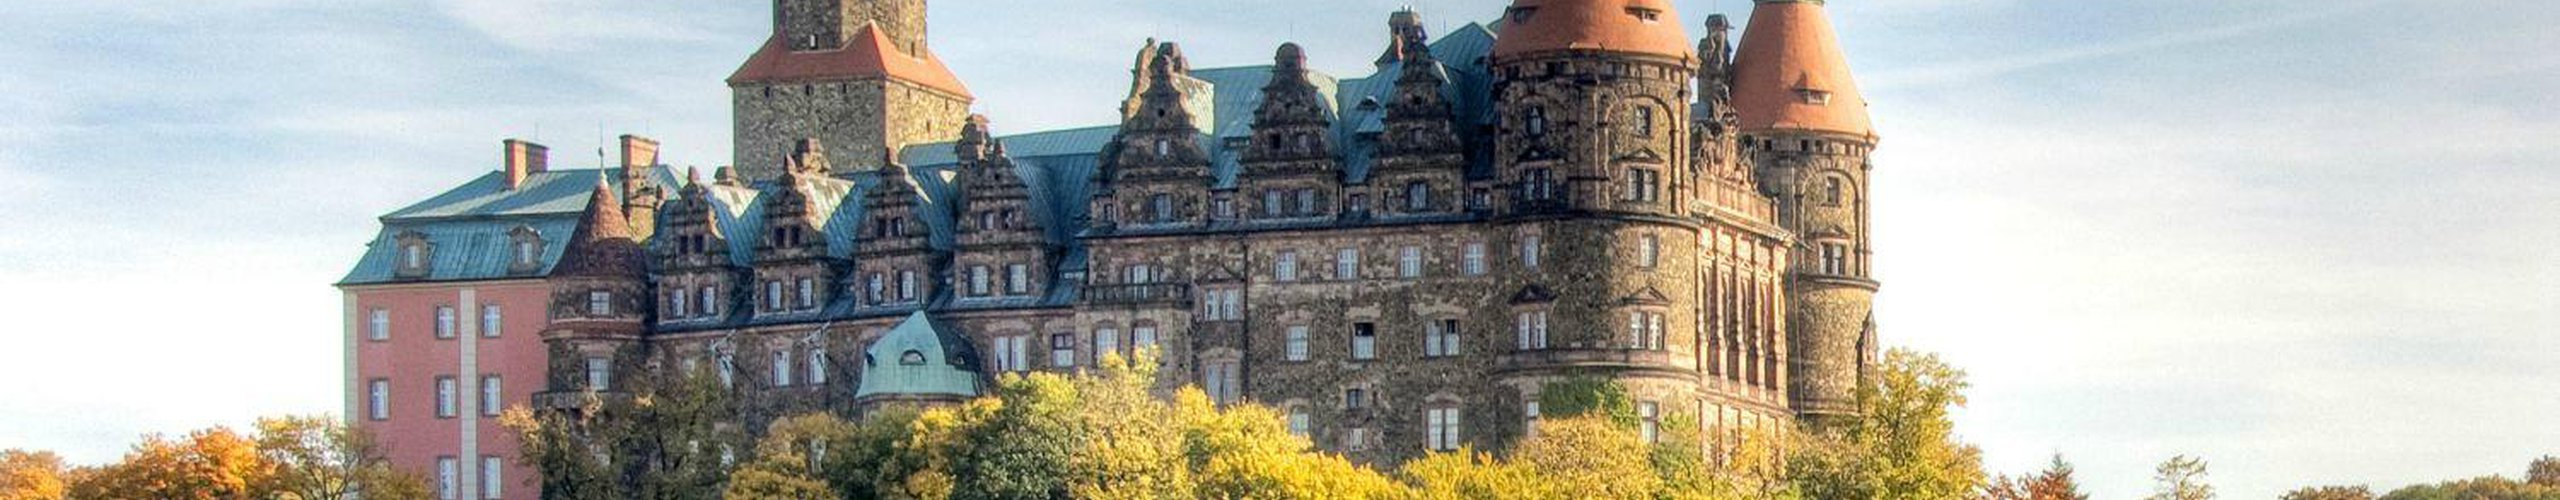 Noclegi Andersa Prices Lodge Reviews Walbrzych Poland